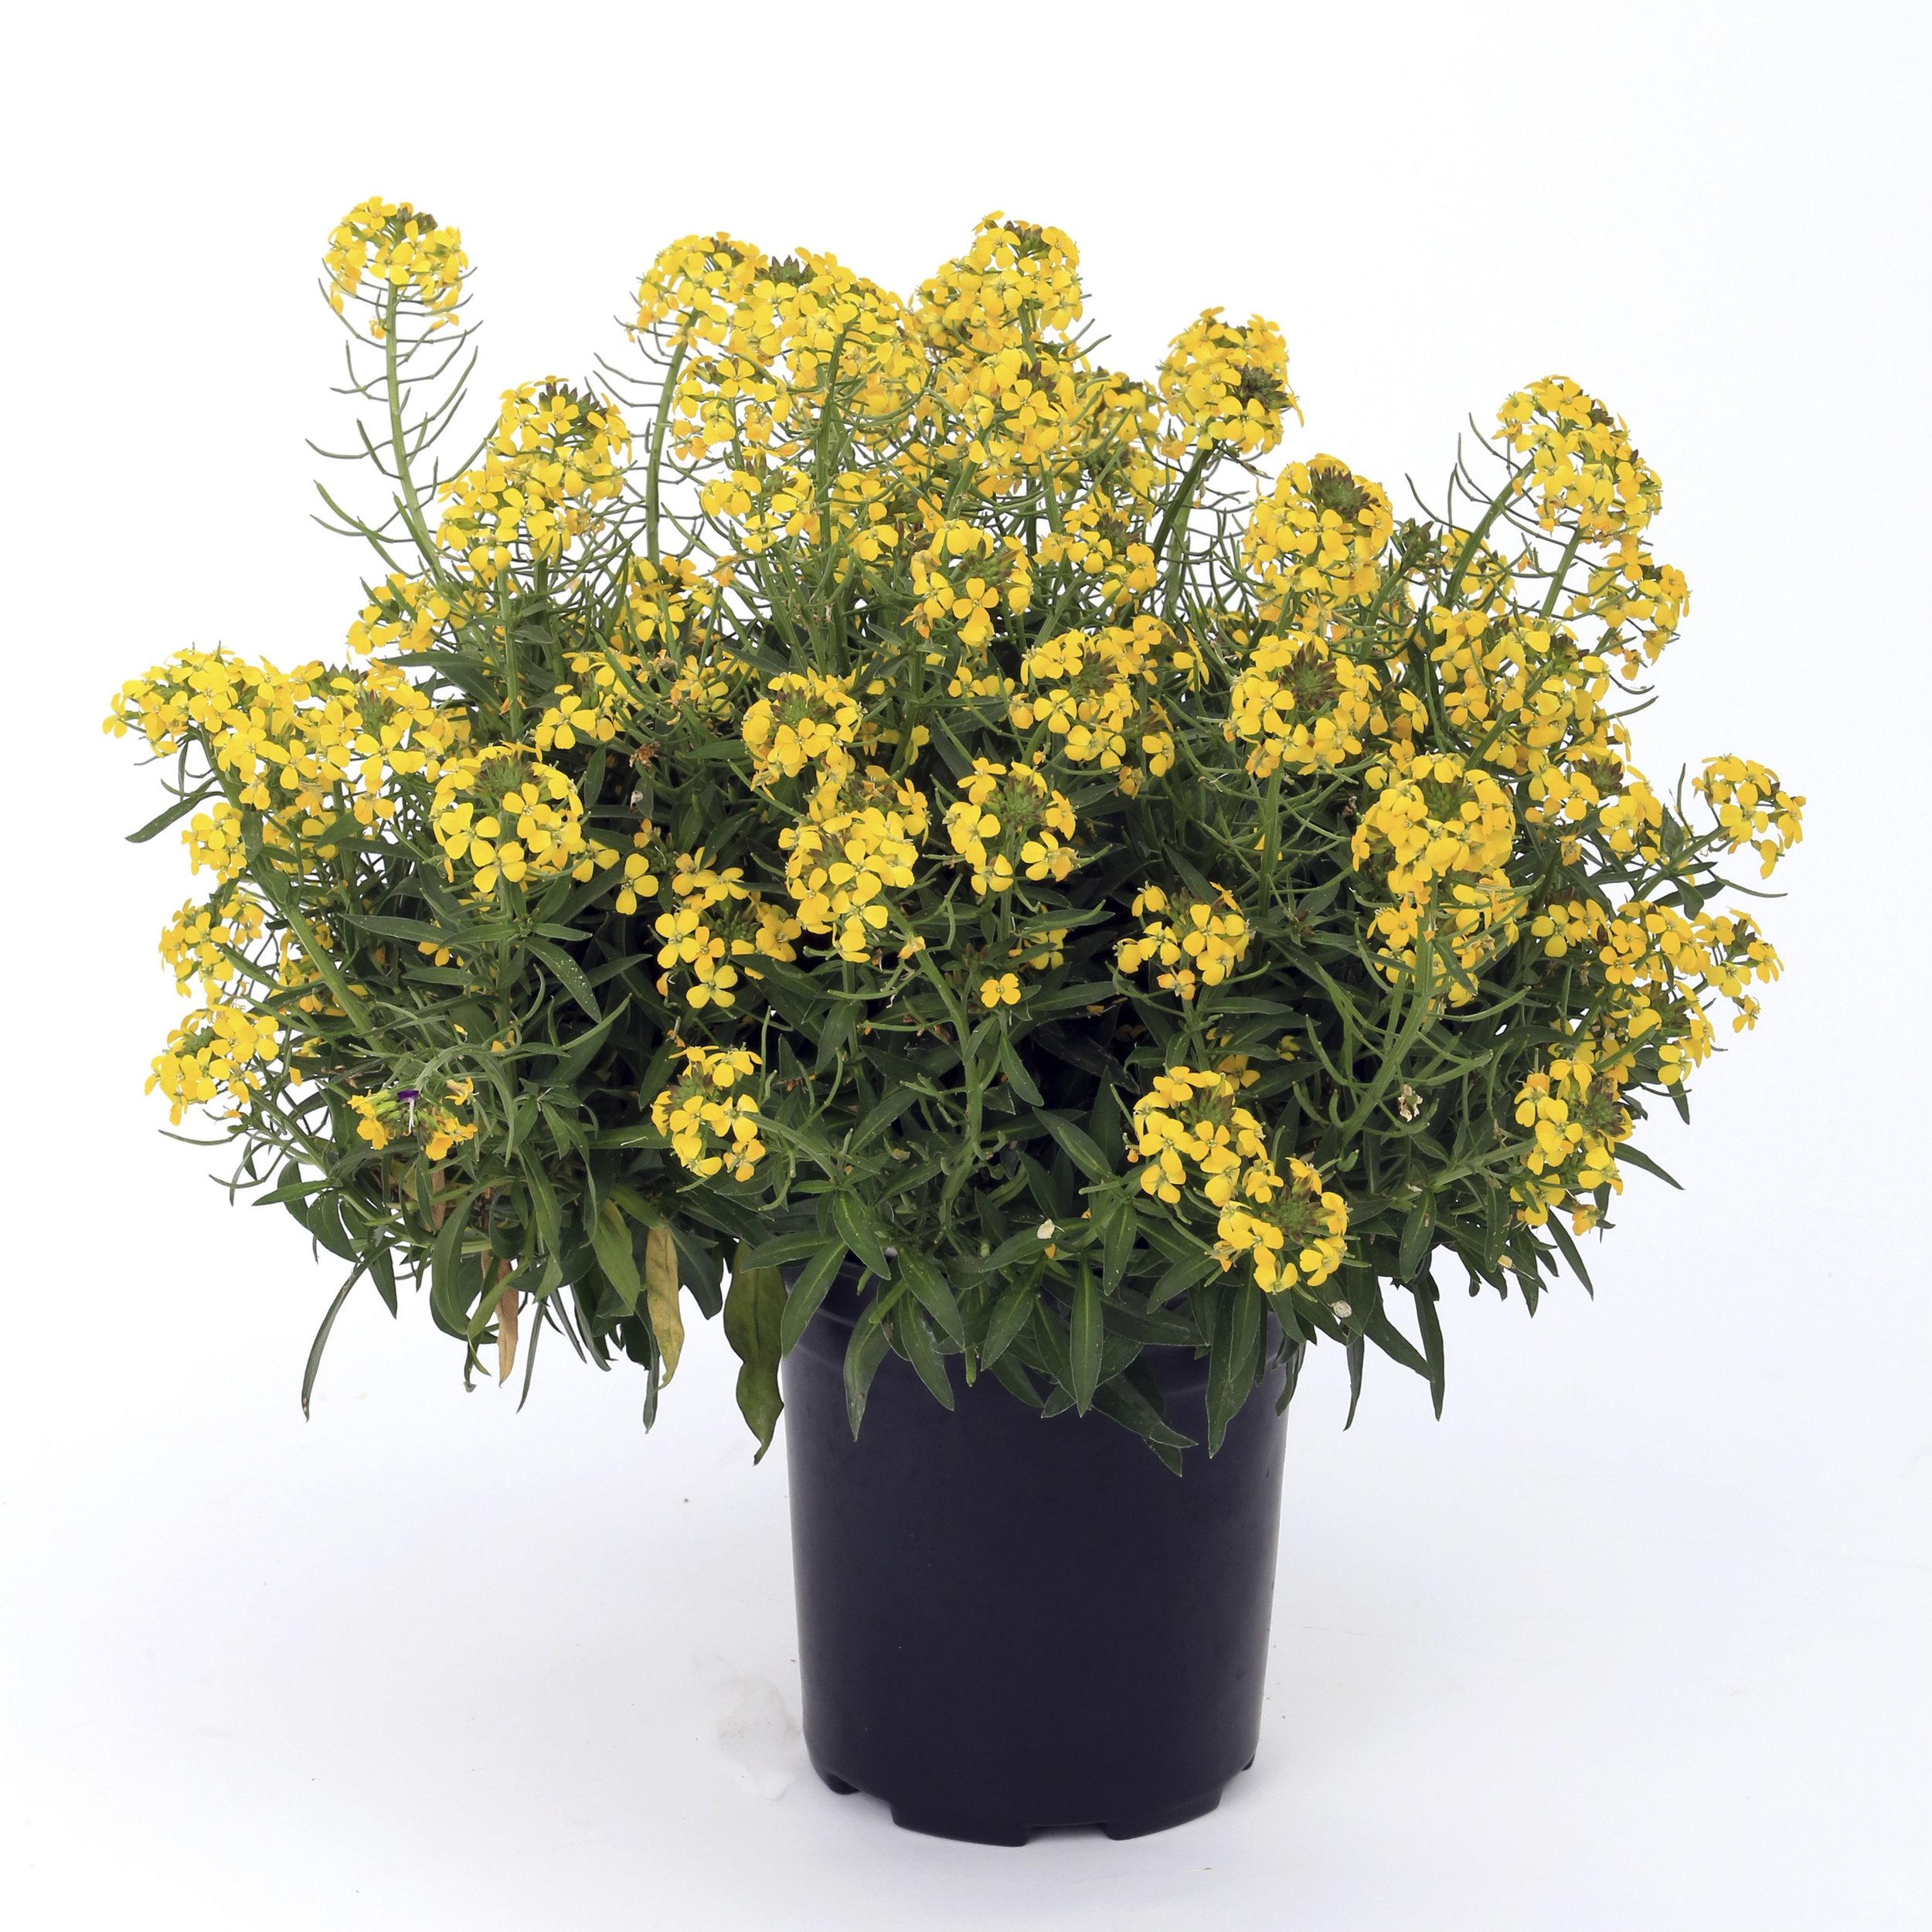 HR_Seed_Erysimum_Canaries™_Canaries™_Yellow_70003599_3.jpg